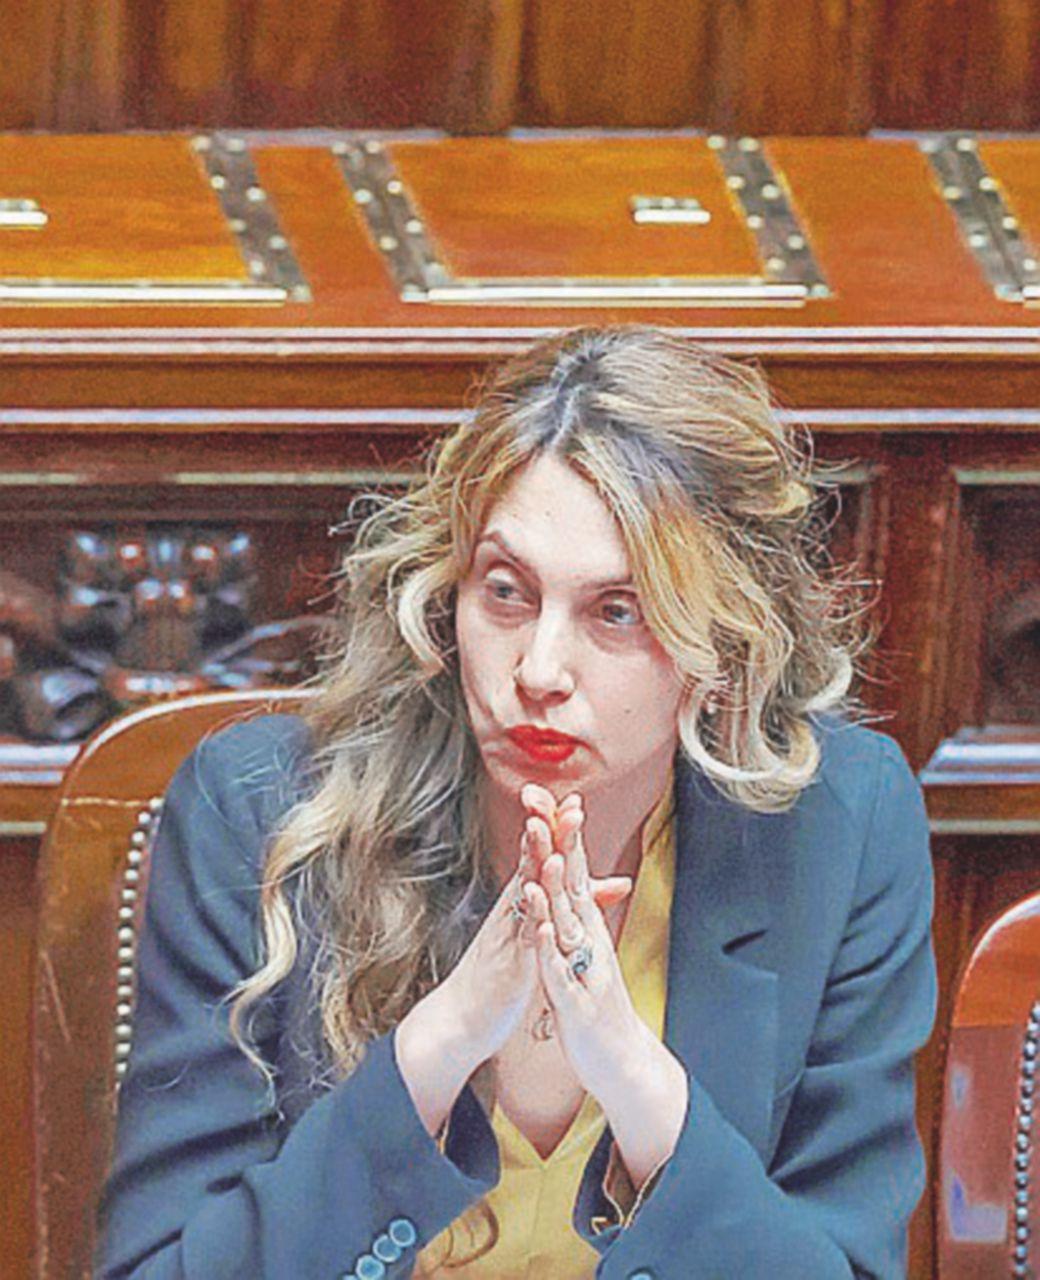 Madia, indaga la commissione interna a Imt